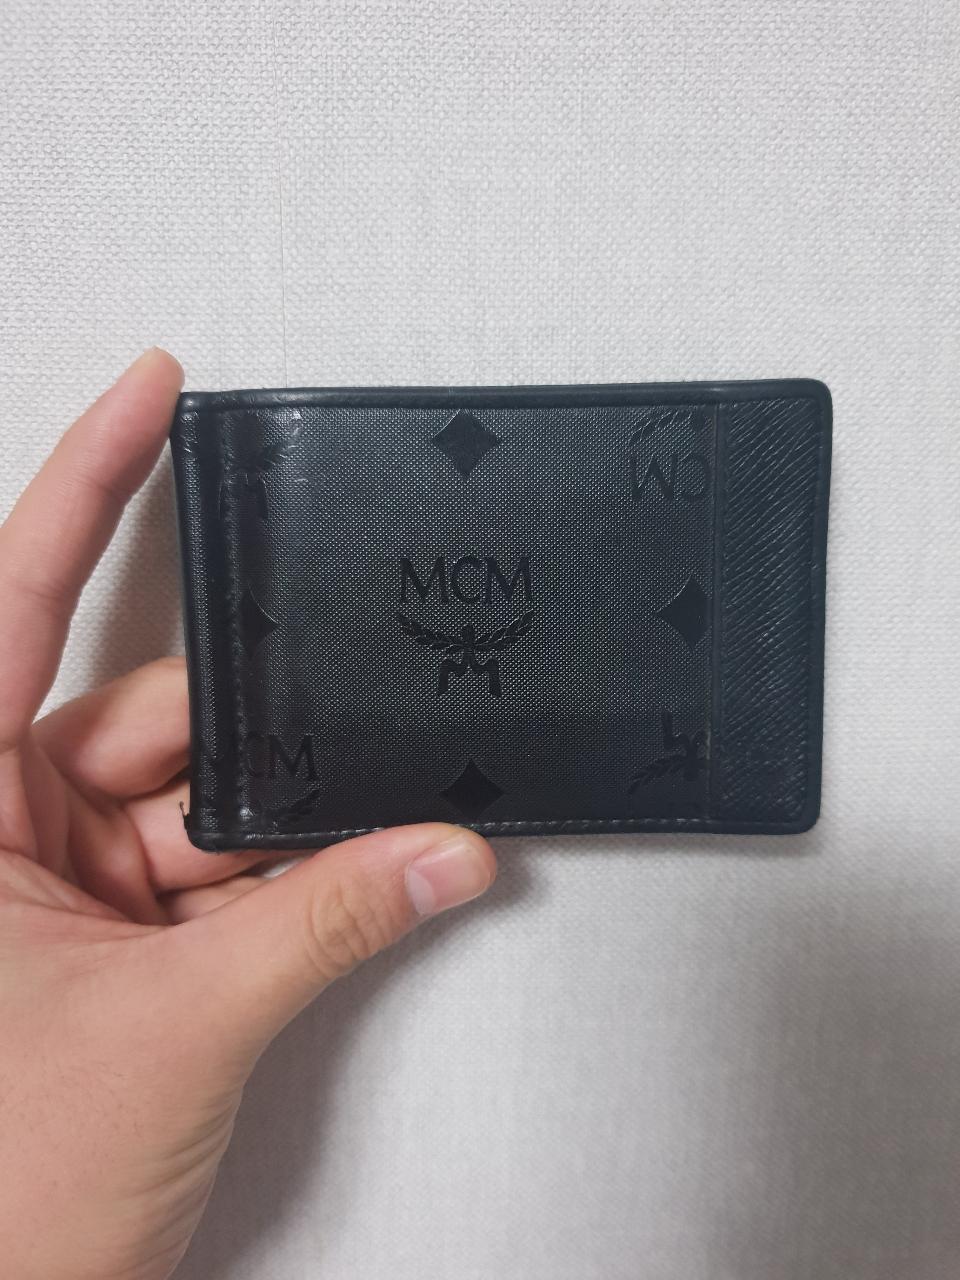 mcm머니클립지갑입니다 ㅎ